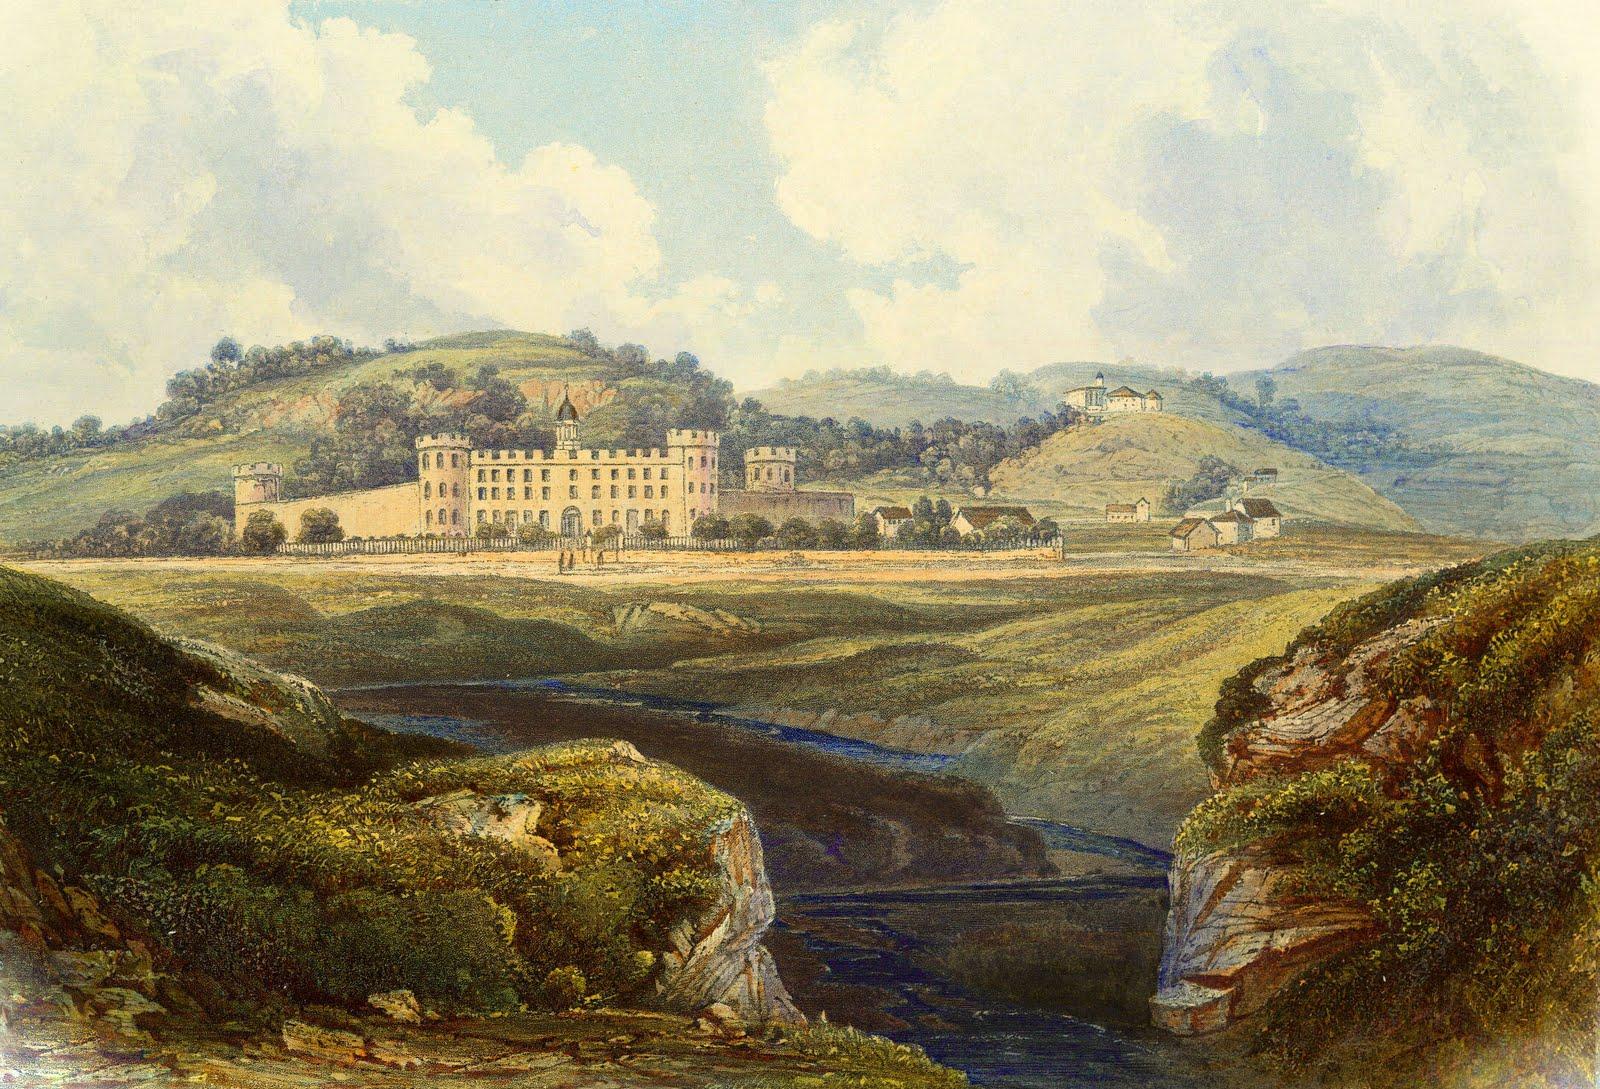 Vintage Printable Image   Landscape Scene with Castle   The